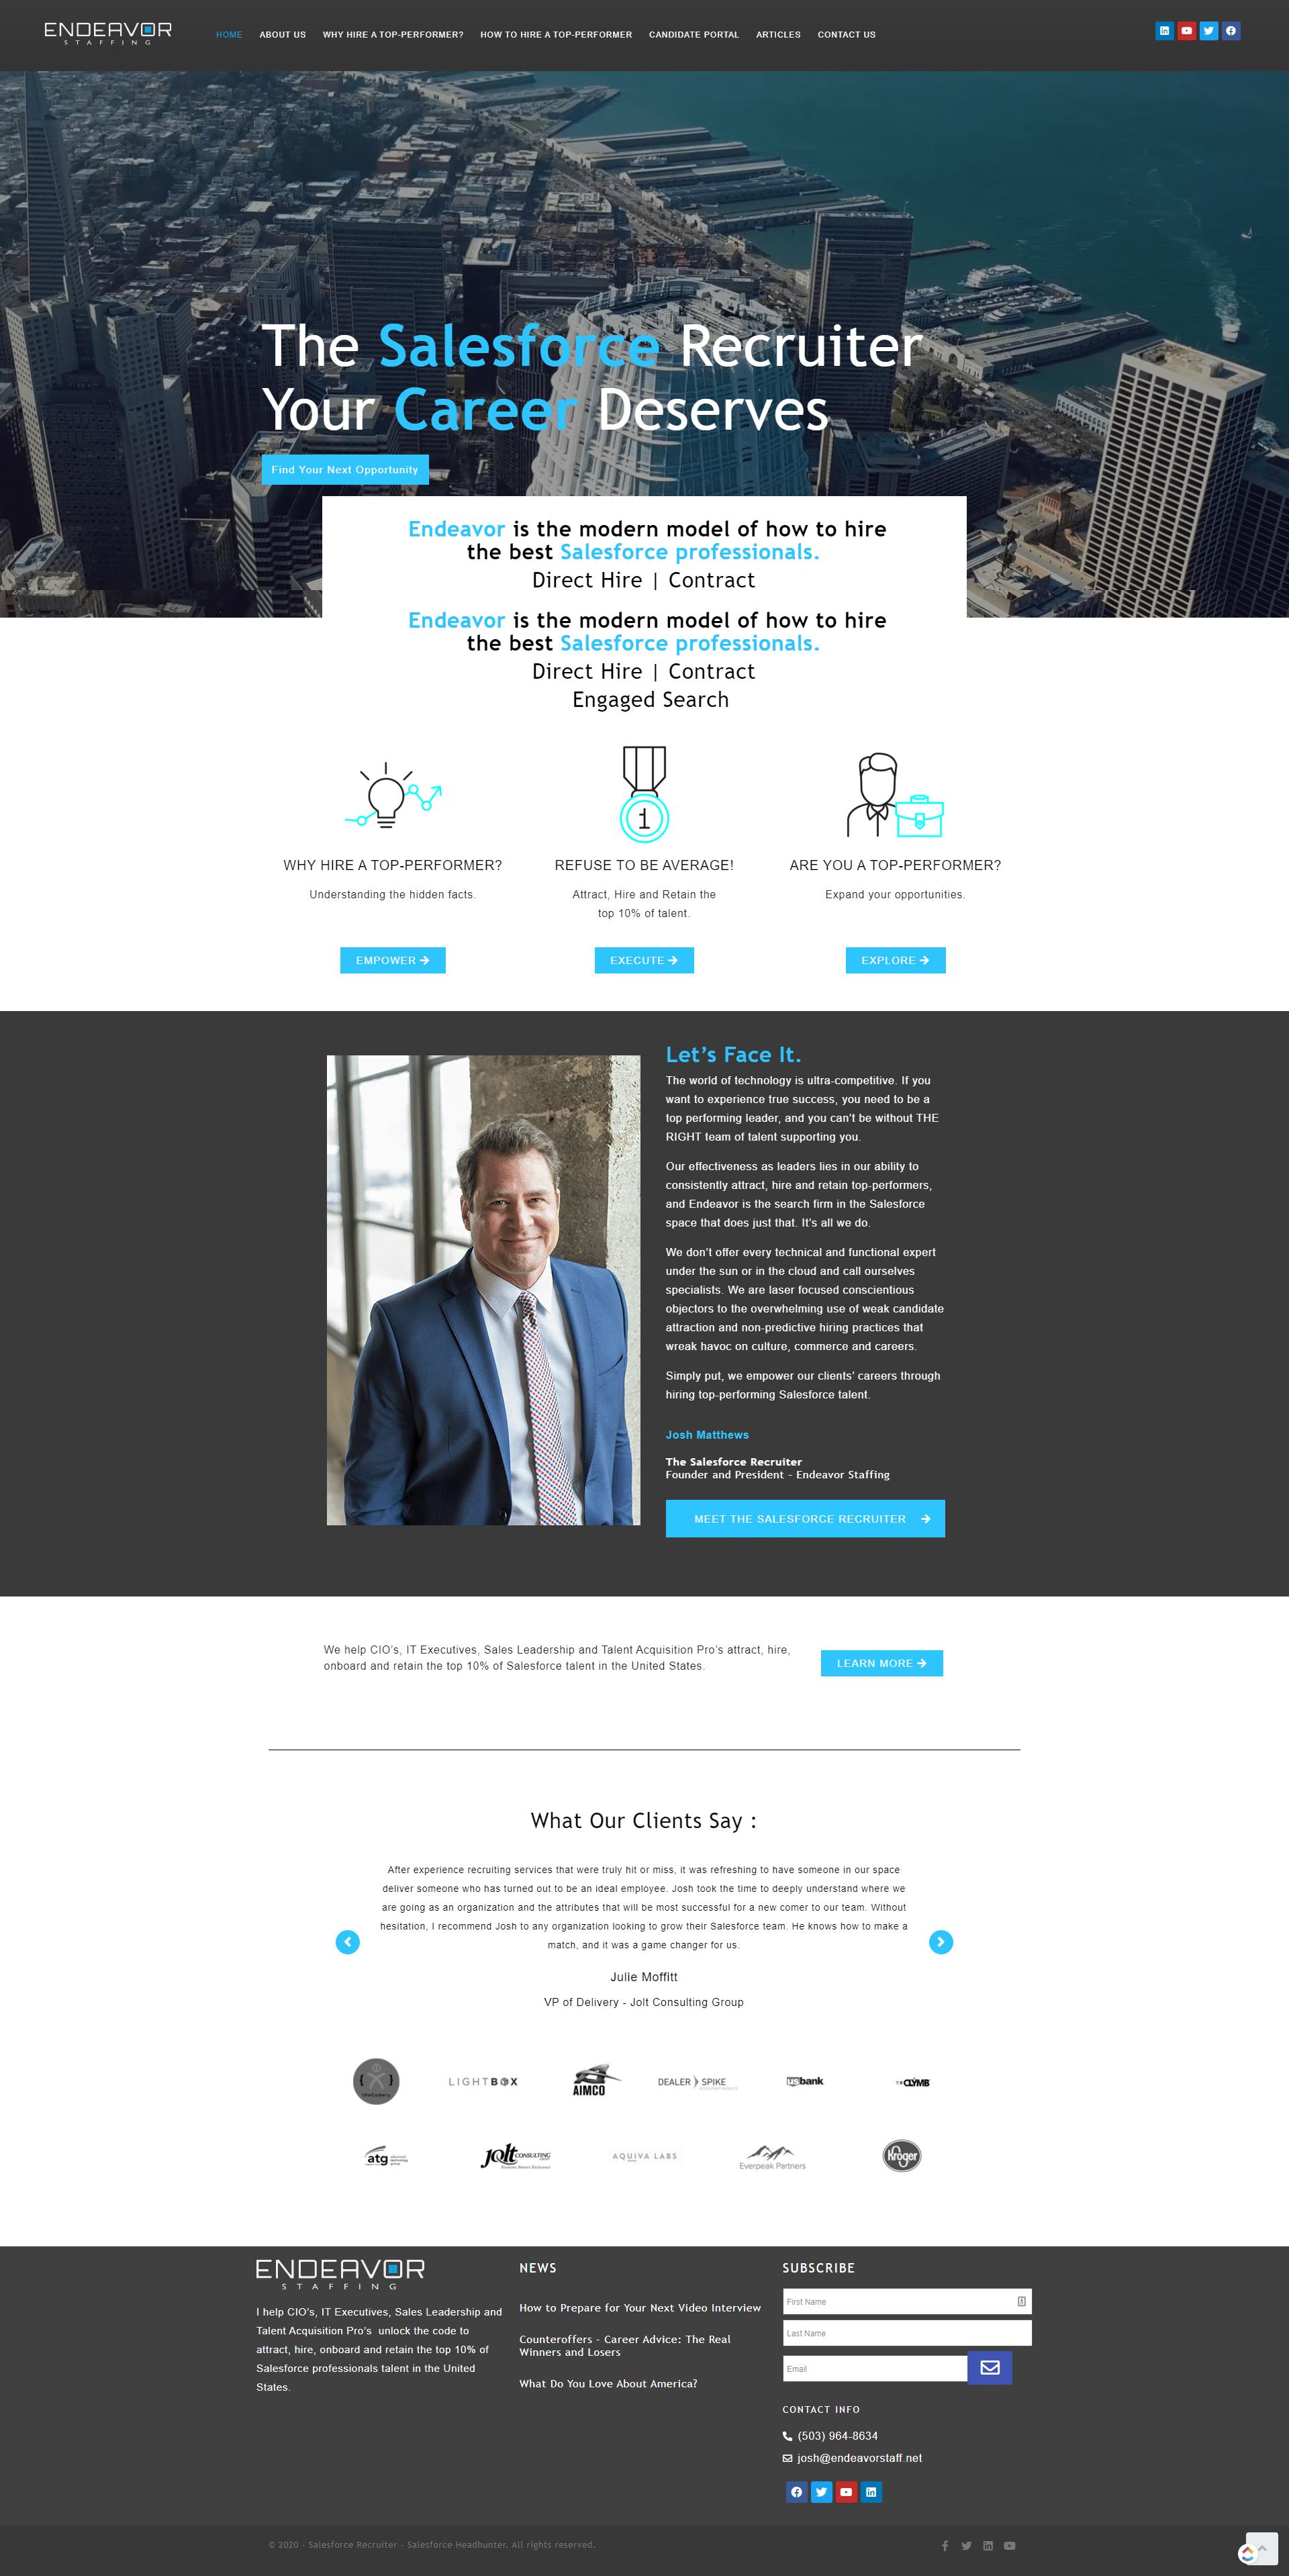 The Salesforce Recruiter